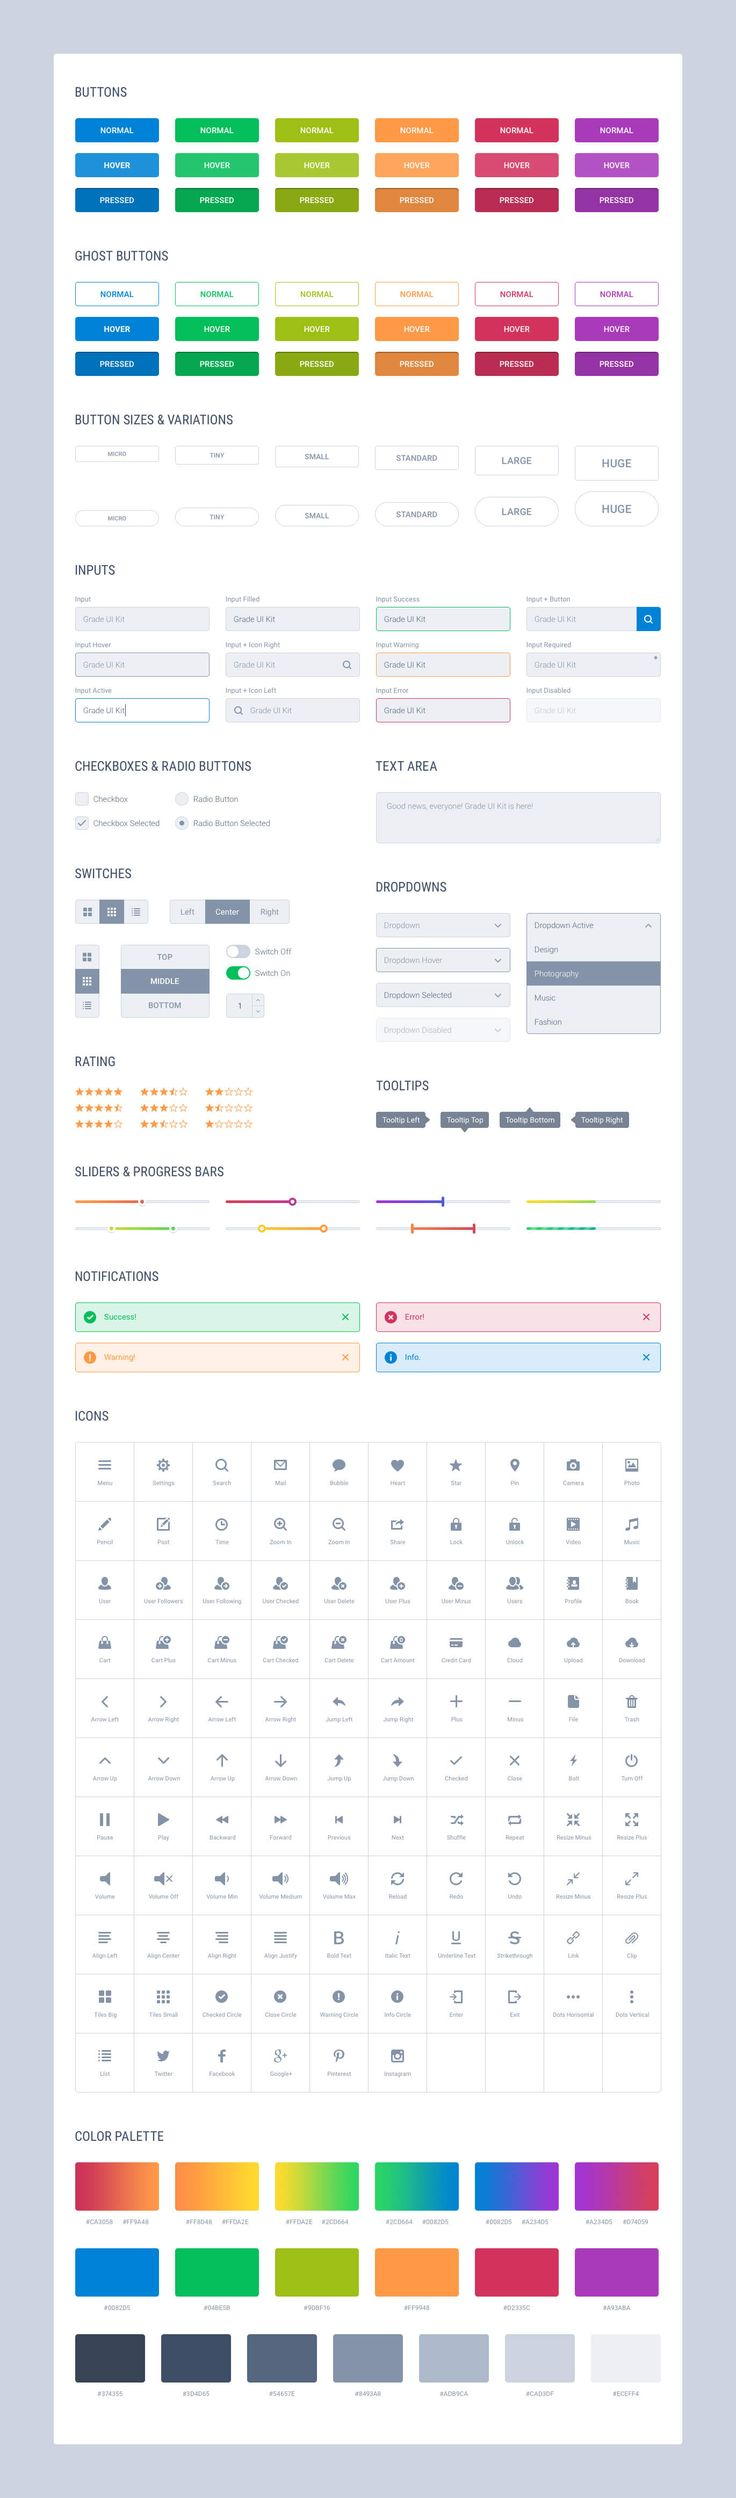 Grade UI Kit: Basic Elements Light.   #UI #UserInterface #UX #UserExperience #Photoshop #Sketch #Design #UIKit #Stylesheet